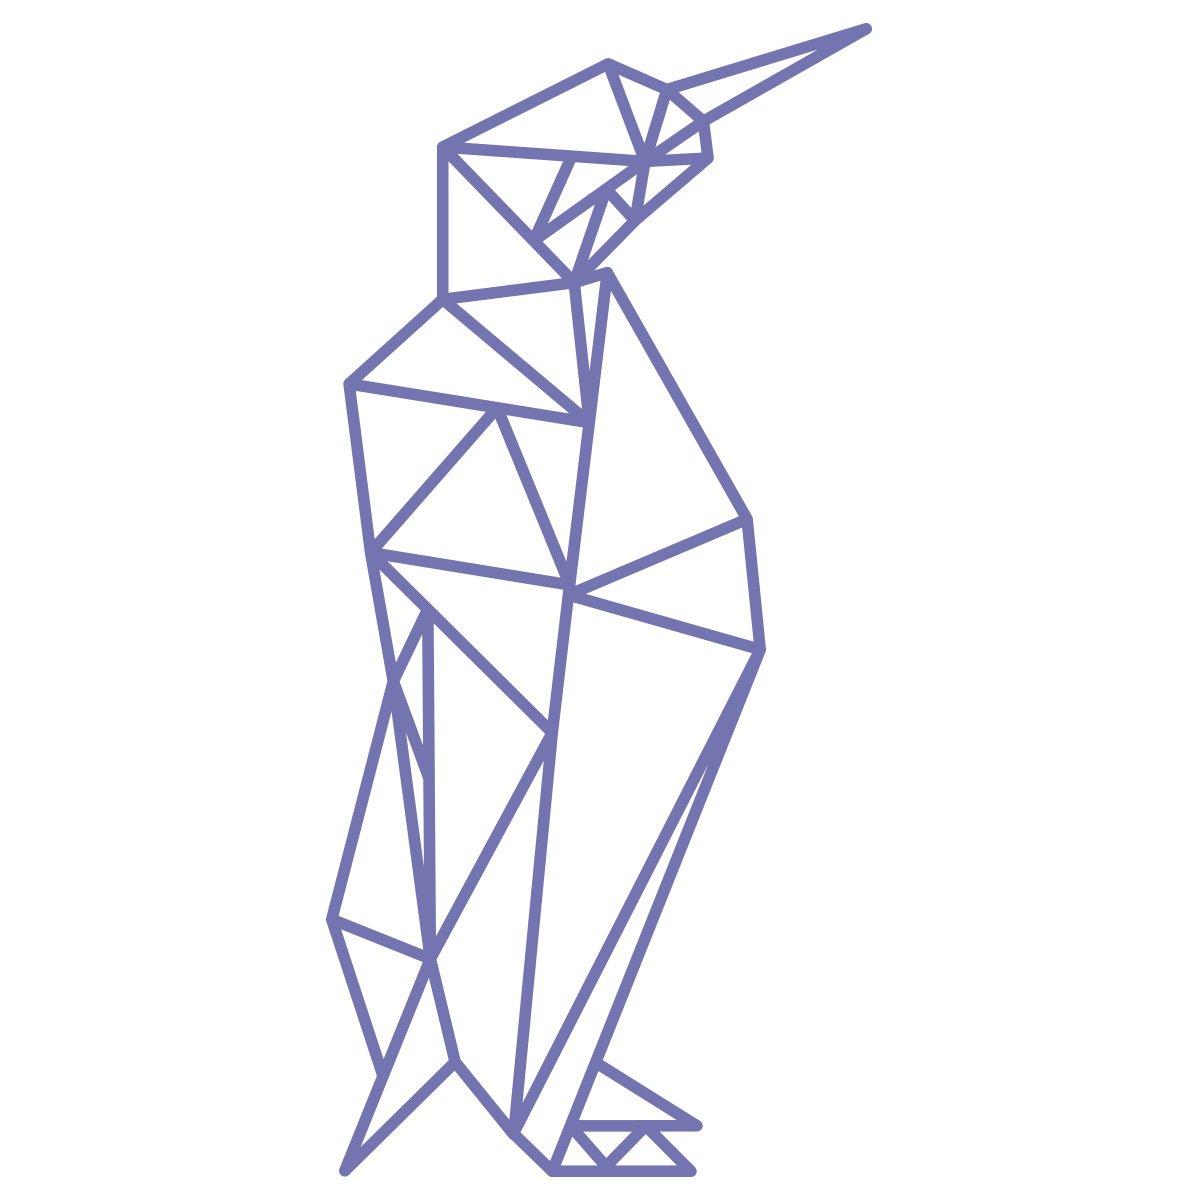 WANDKINGS Wandtattoo Wandtattoo Wandtattoo - Origami-Style Pinguin - 52 x 110 cm - HellRosa - Wähle aus 5 Größen & 35 Farben B07C9JDD3R Wandsticker & Wandfiguren 6e918c